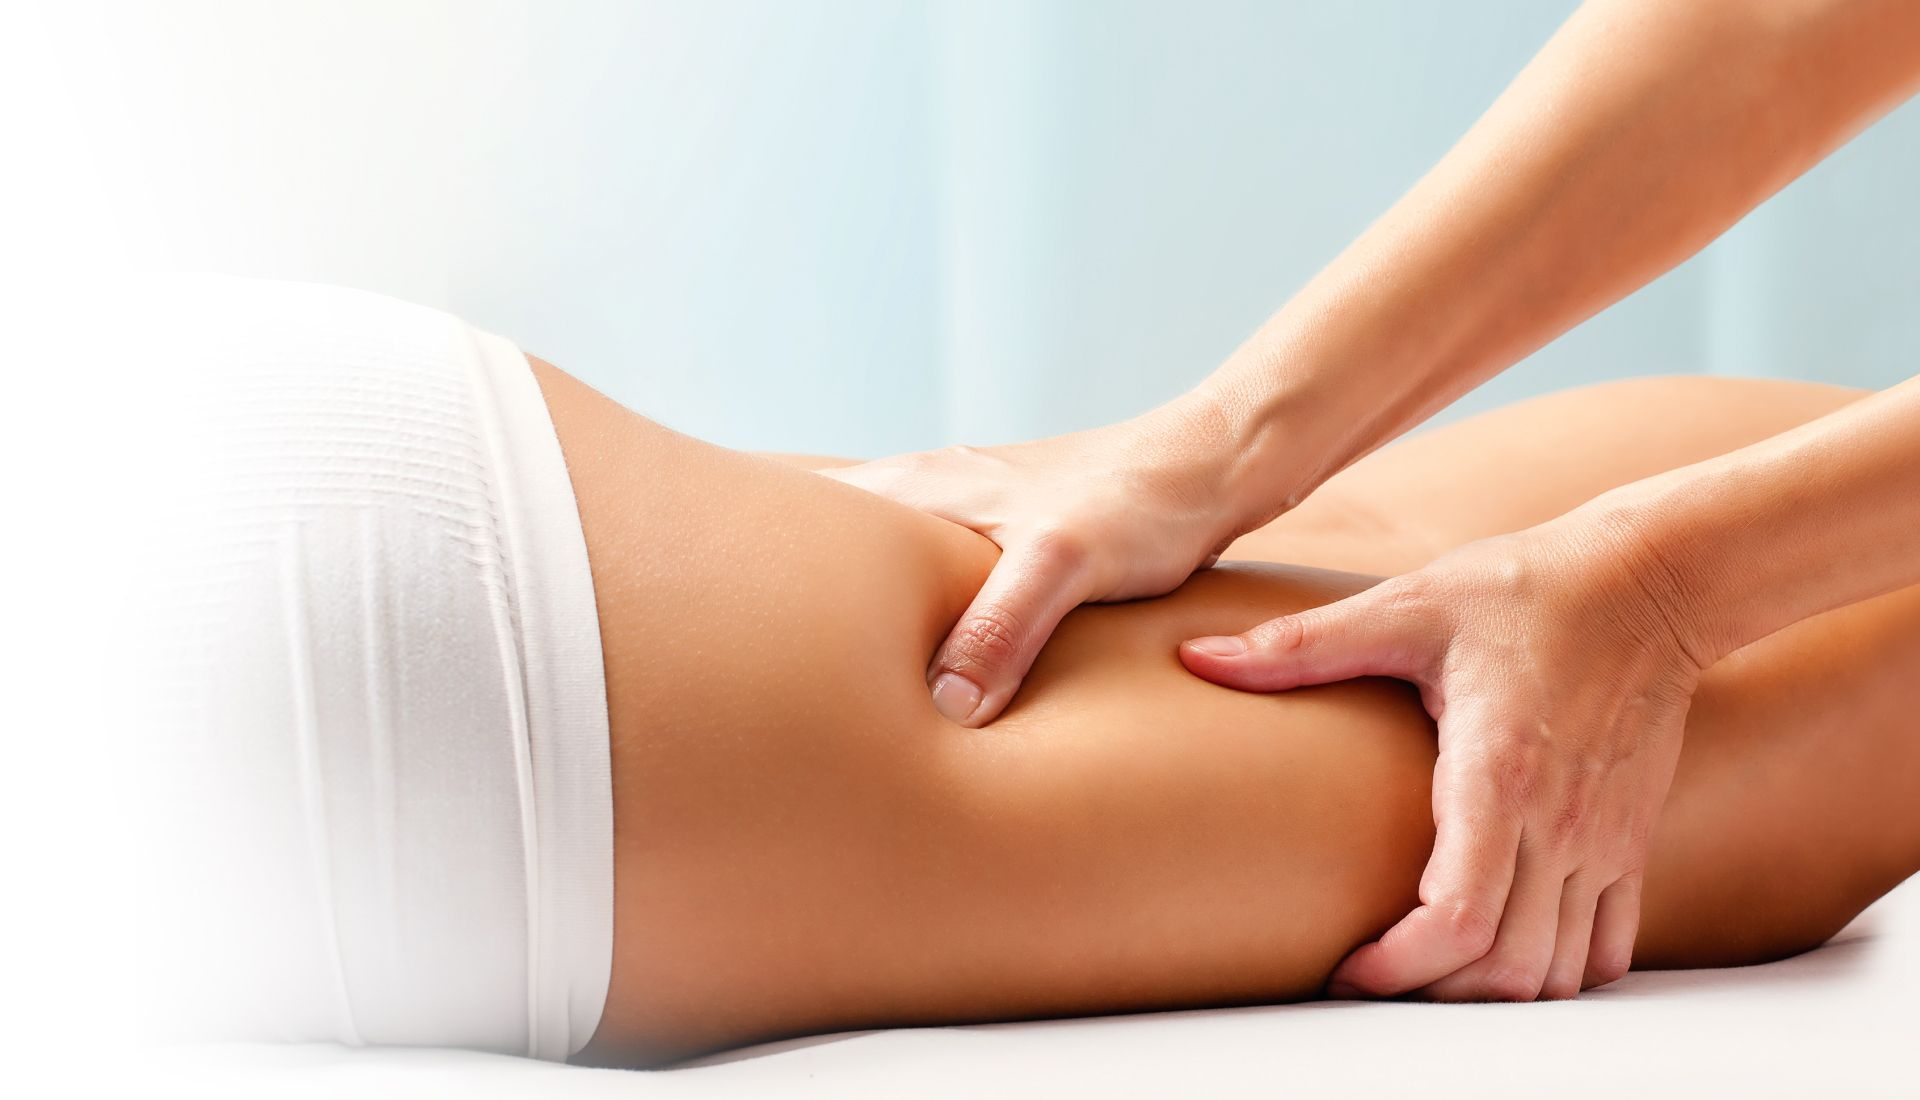 Fisioterapeuta y Osteopatía Profesional | Clínica María González de Fisioterapia en Burjassot